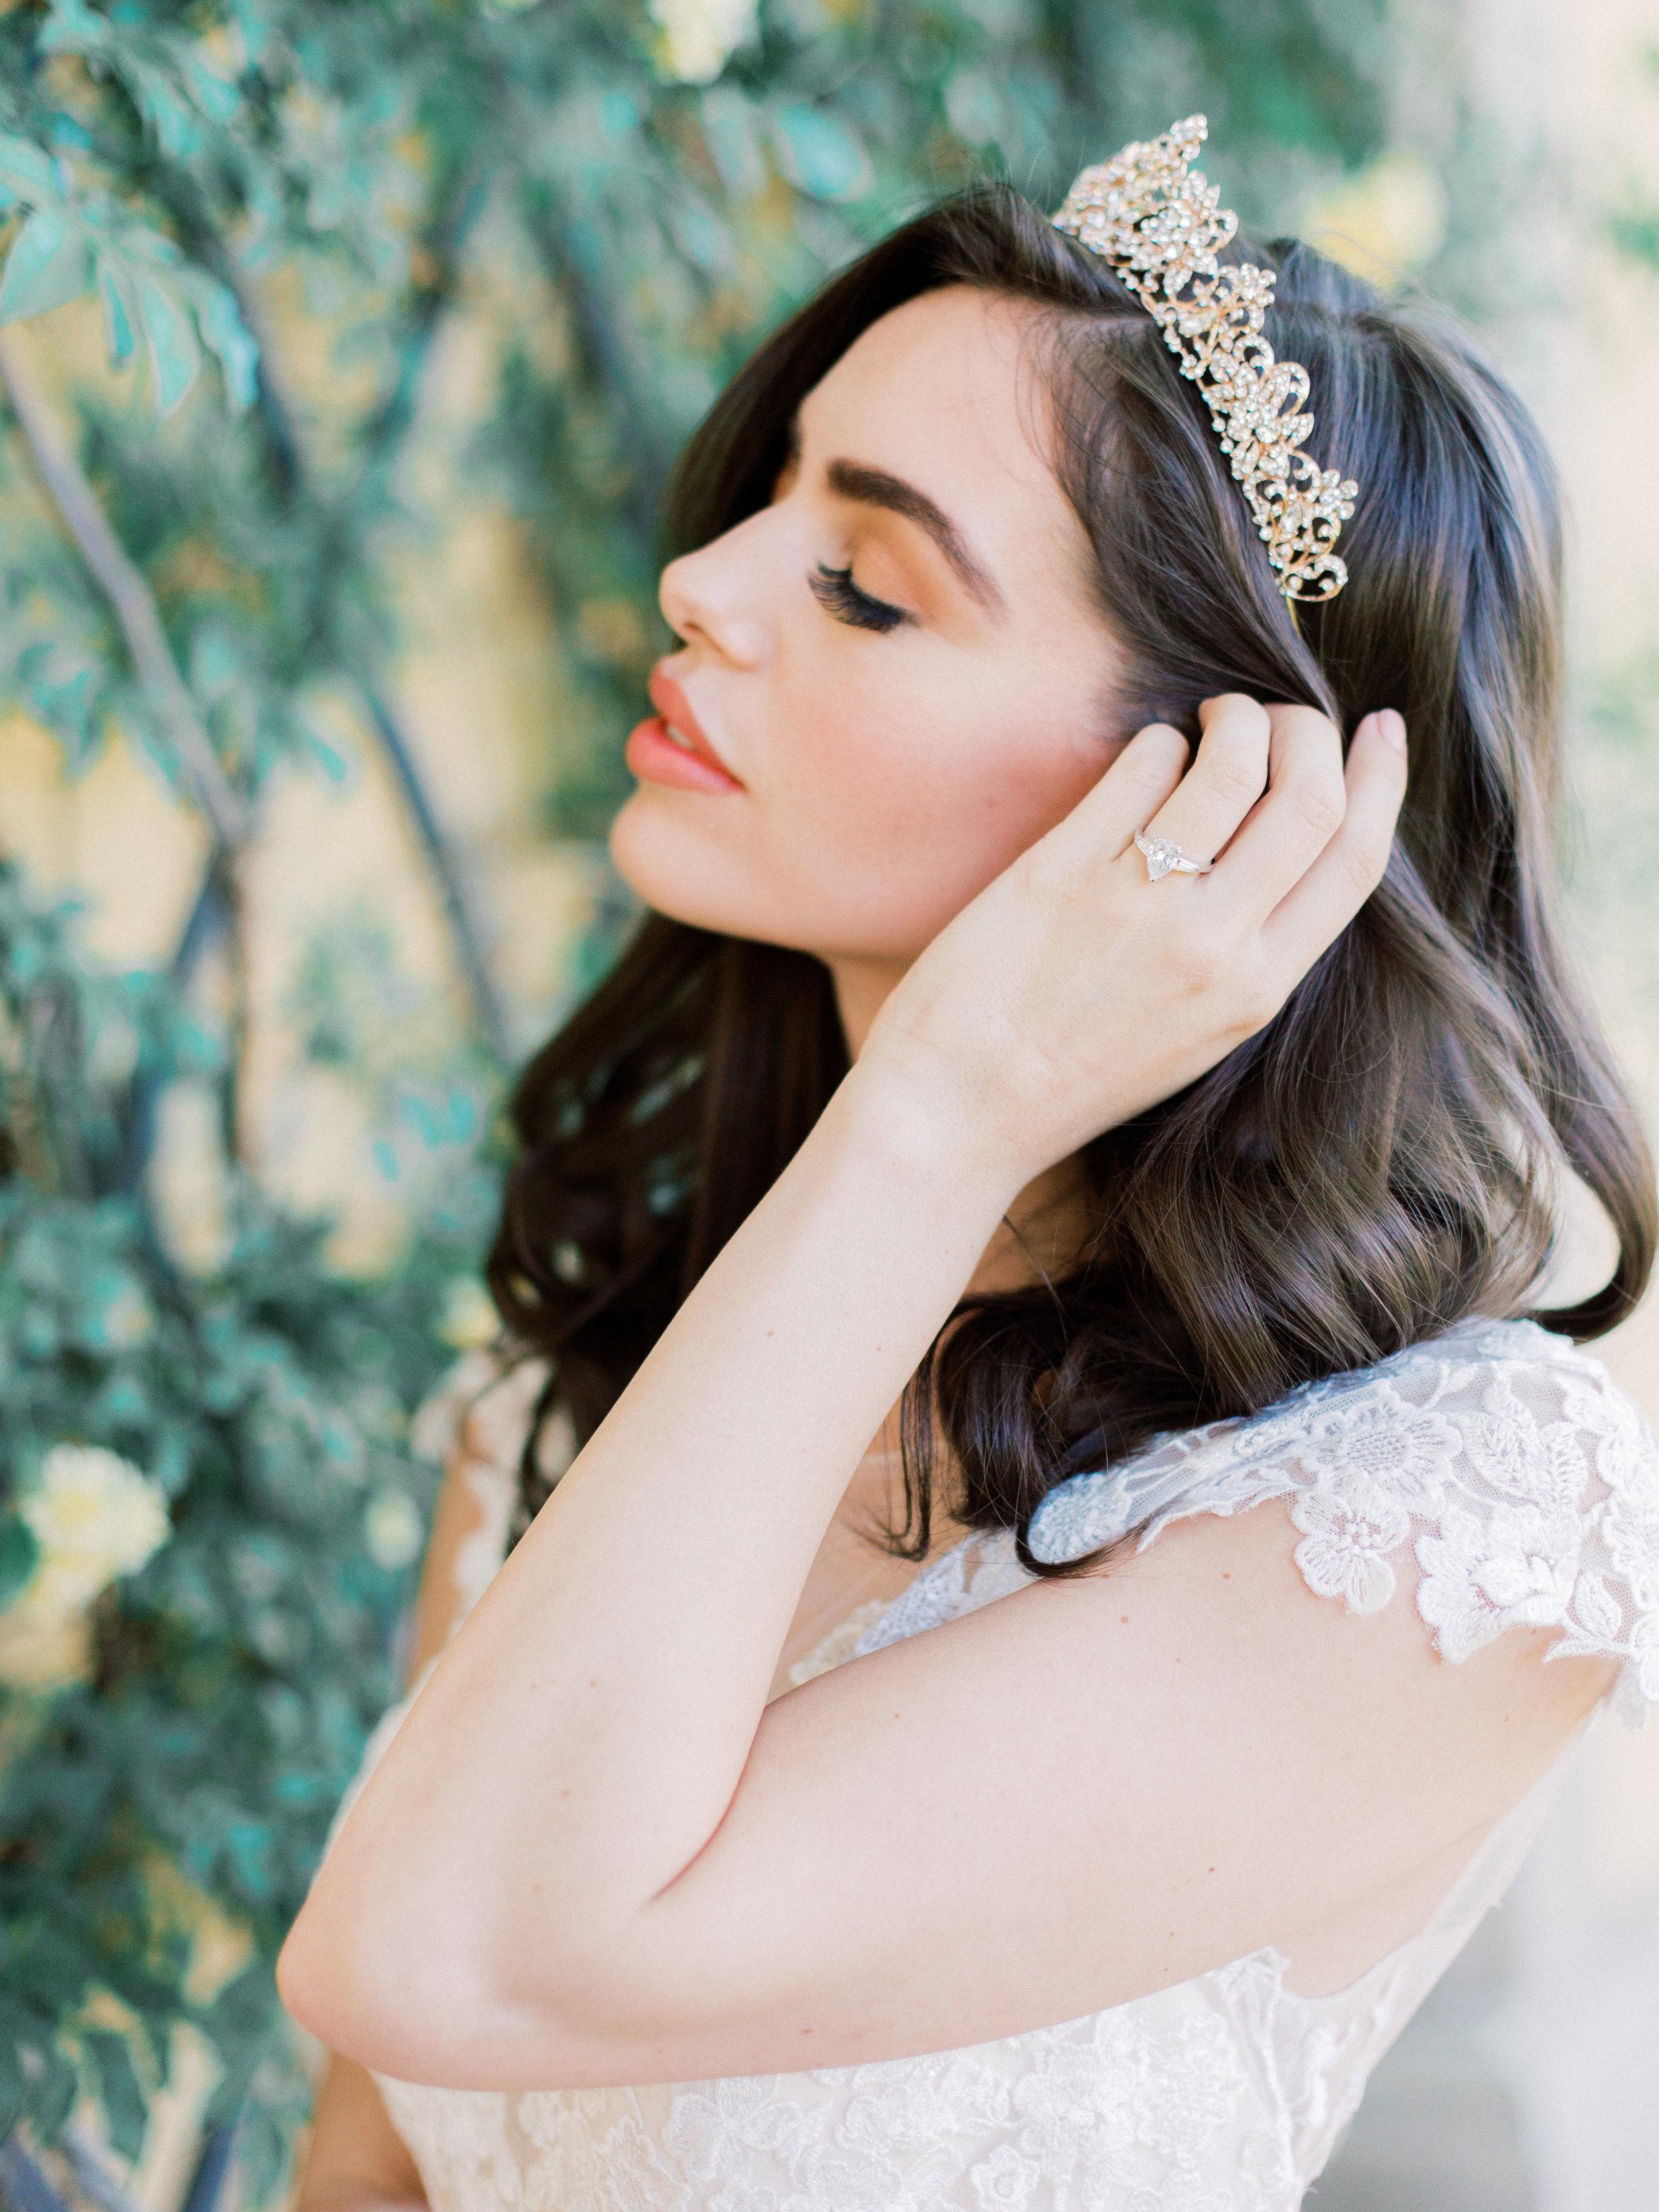 TiffanySangsterPhotography-5.jpg